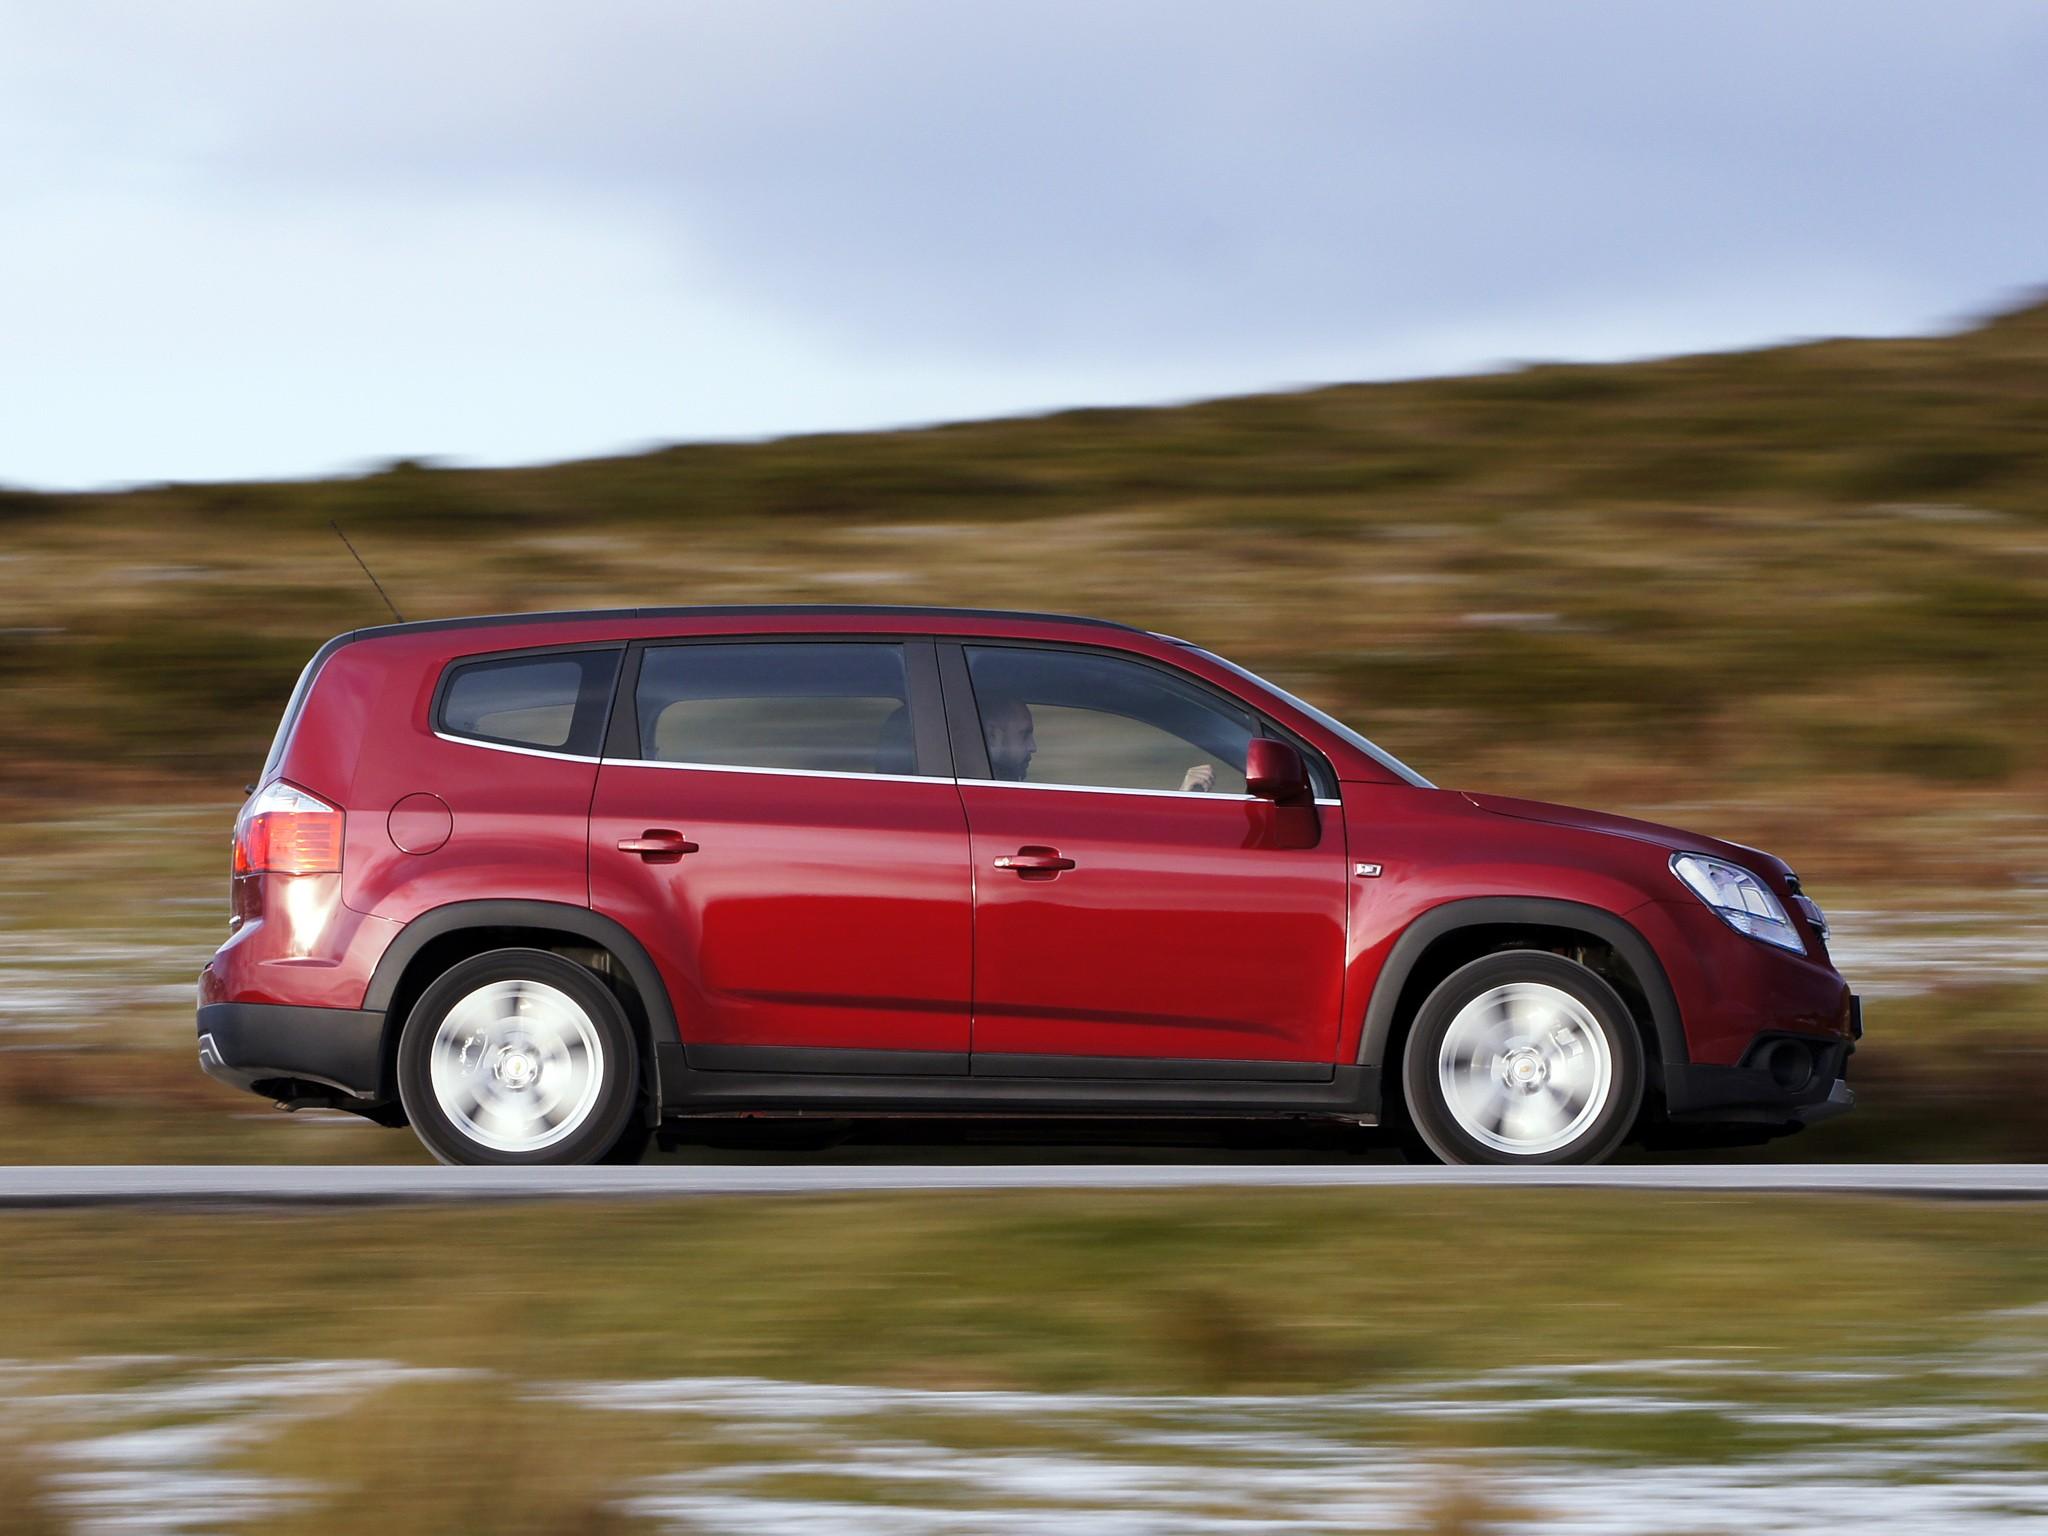 2020 GMC Terrain: News, Specs, Price >> 2020 Gmc Terrain News Specs Price Upcoming New Car Release 2020